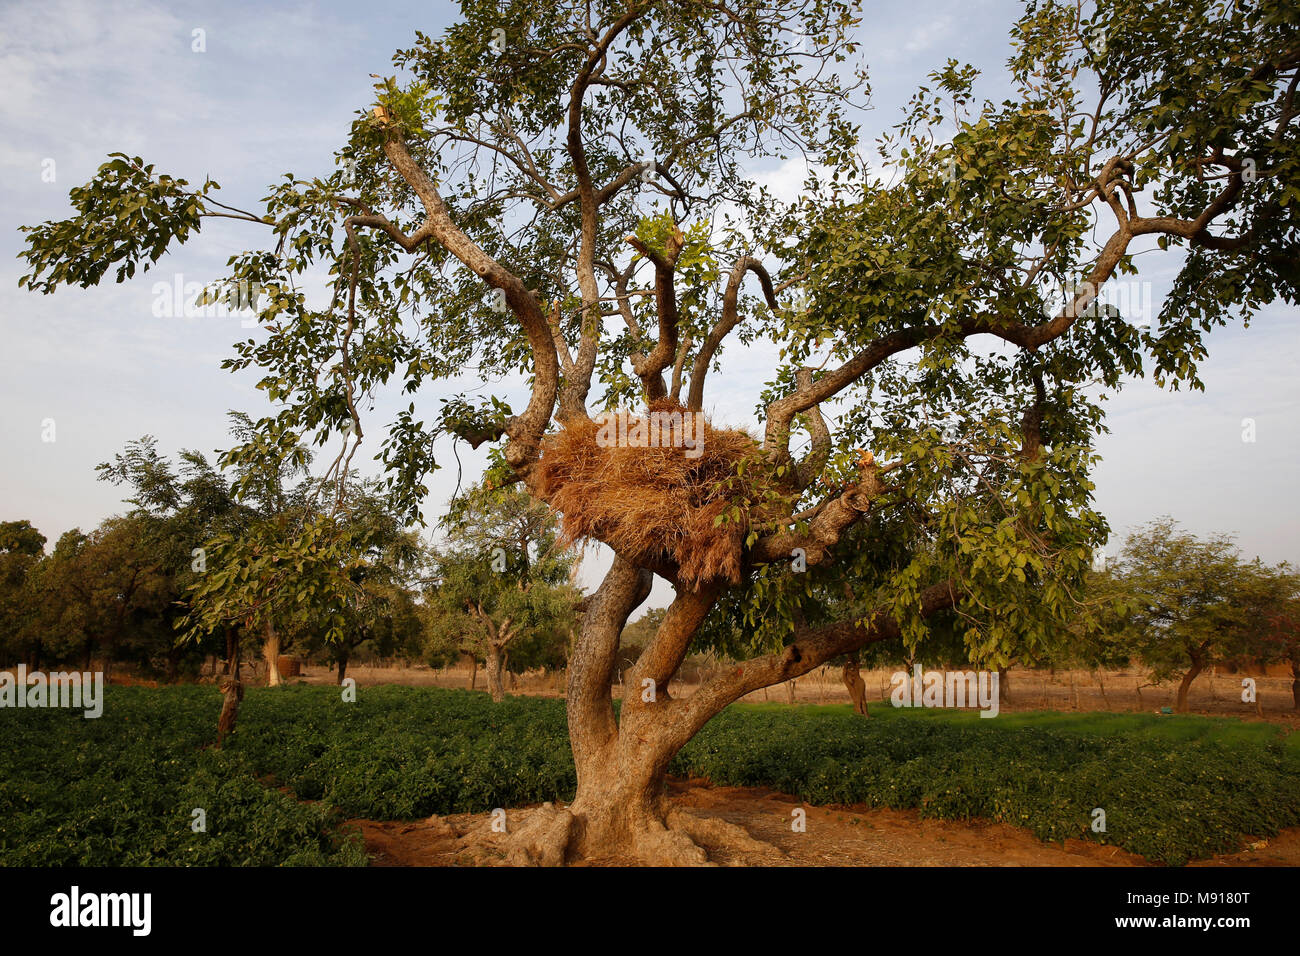 Burkina Faso. Cattle fodder kept on tree branches. - Stock Image